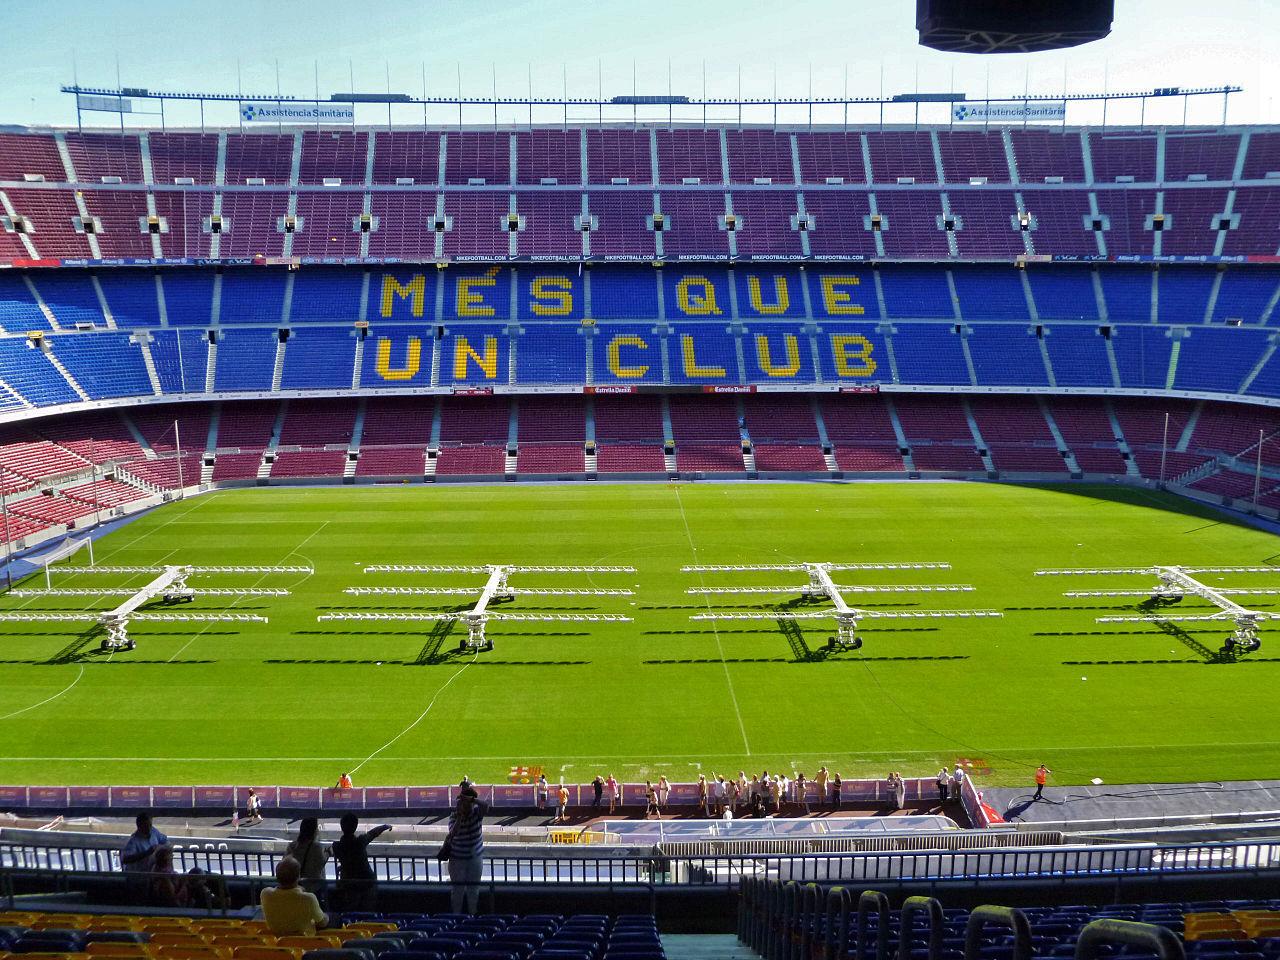 Стадион Барселоны, слоган Больше, чем клуб